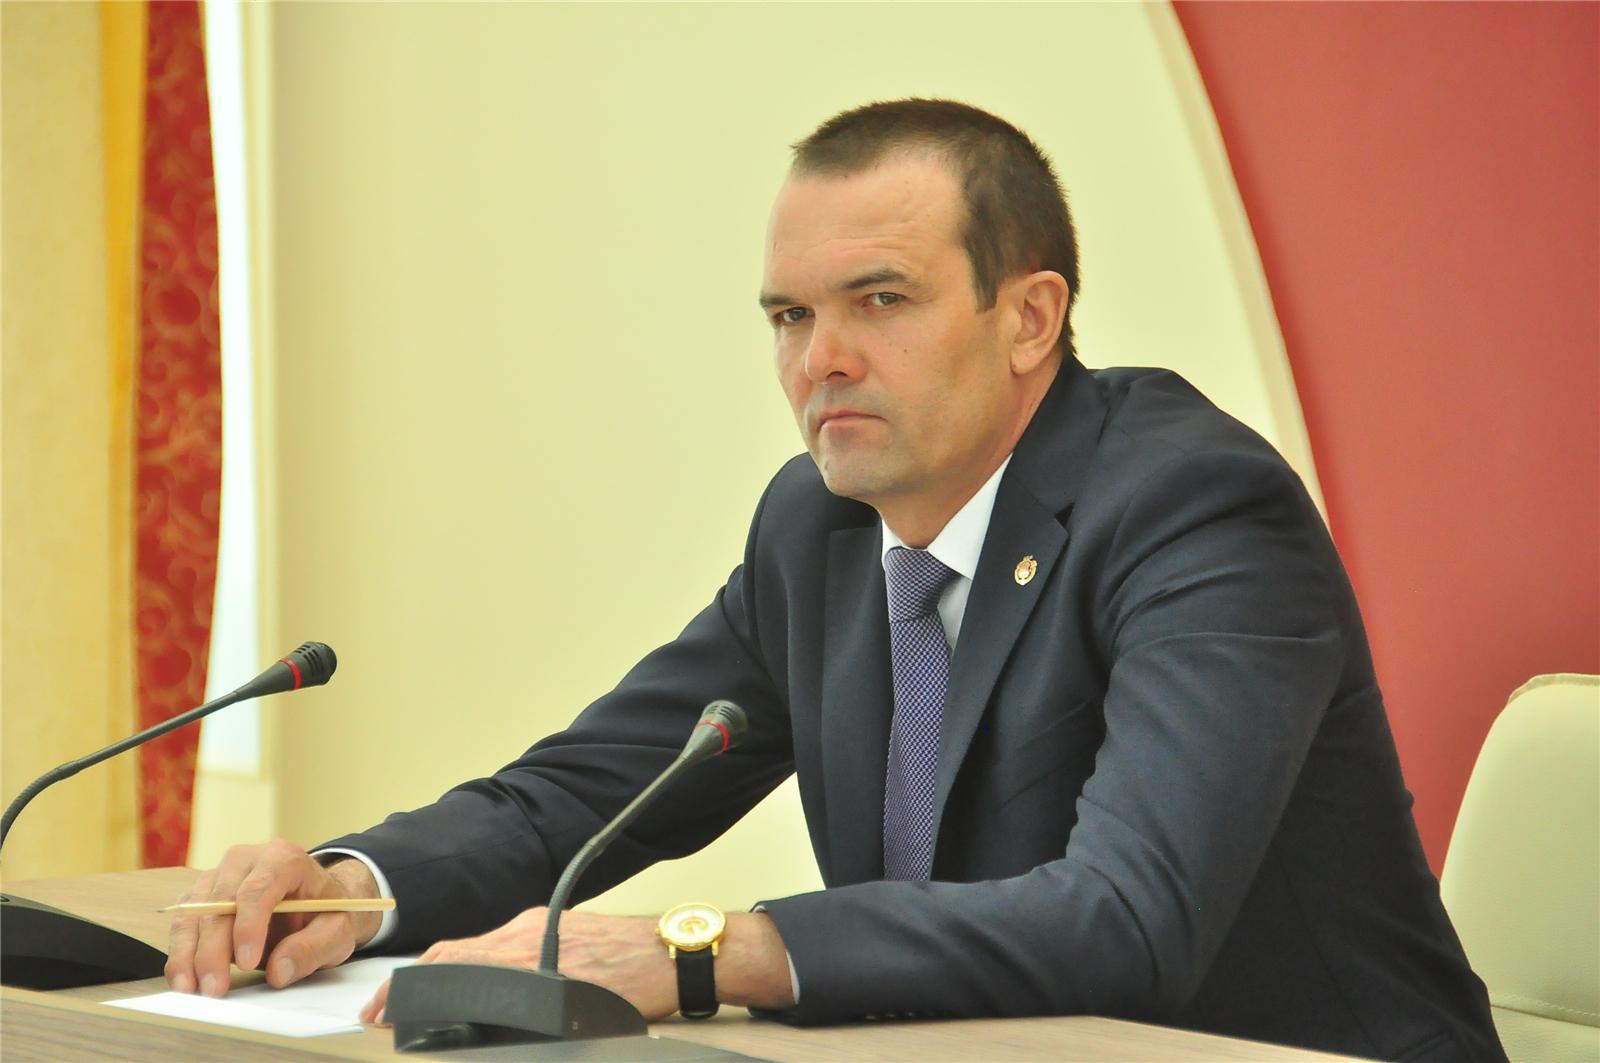 Путин отправил главу Чувашии в отставку «в связи с утратой доверия»